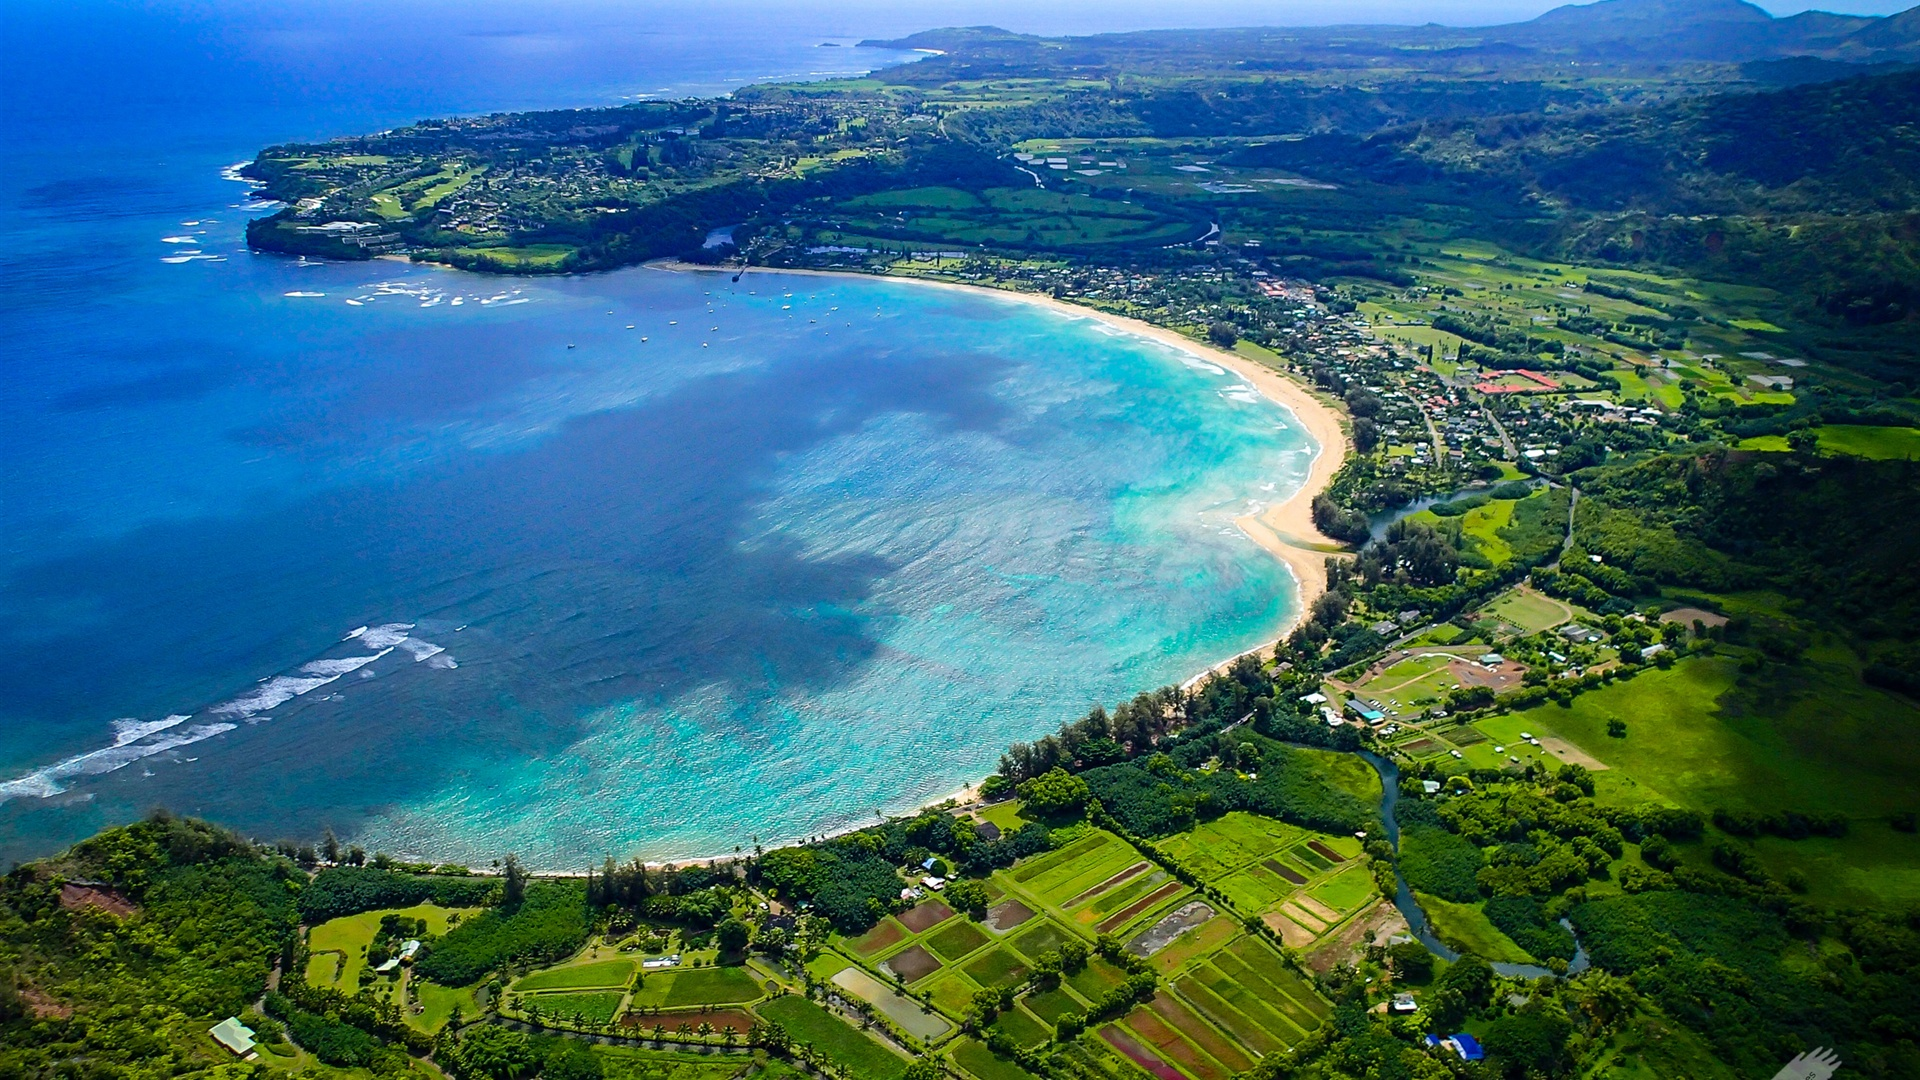 Island Hawaii Hanalei Bay Beach Sea Coast   High Definition Wallpapers 1920x1080